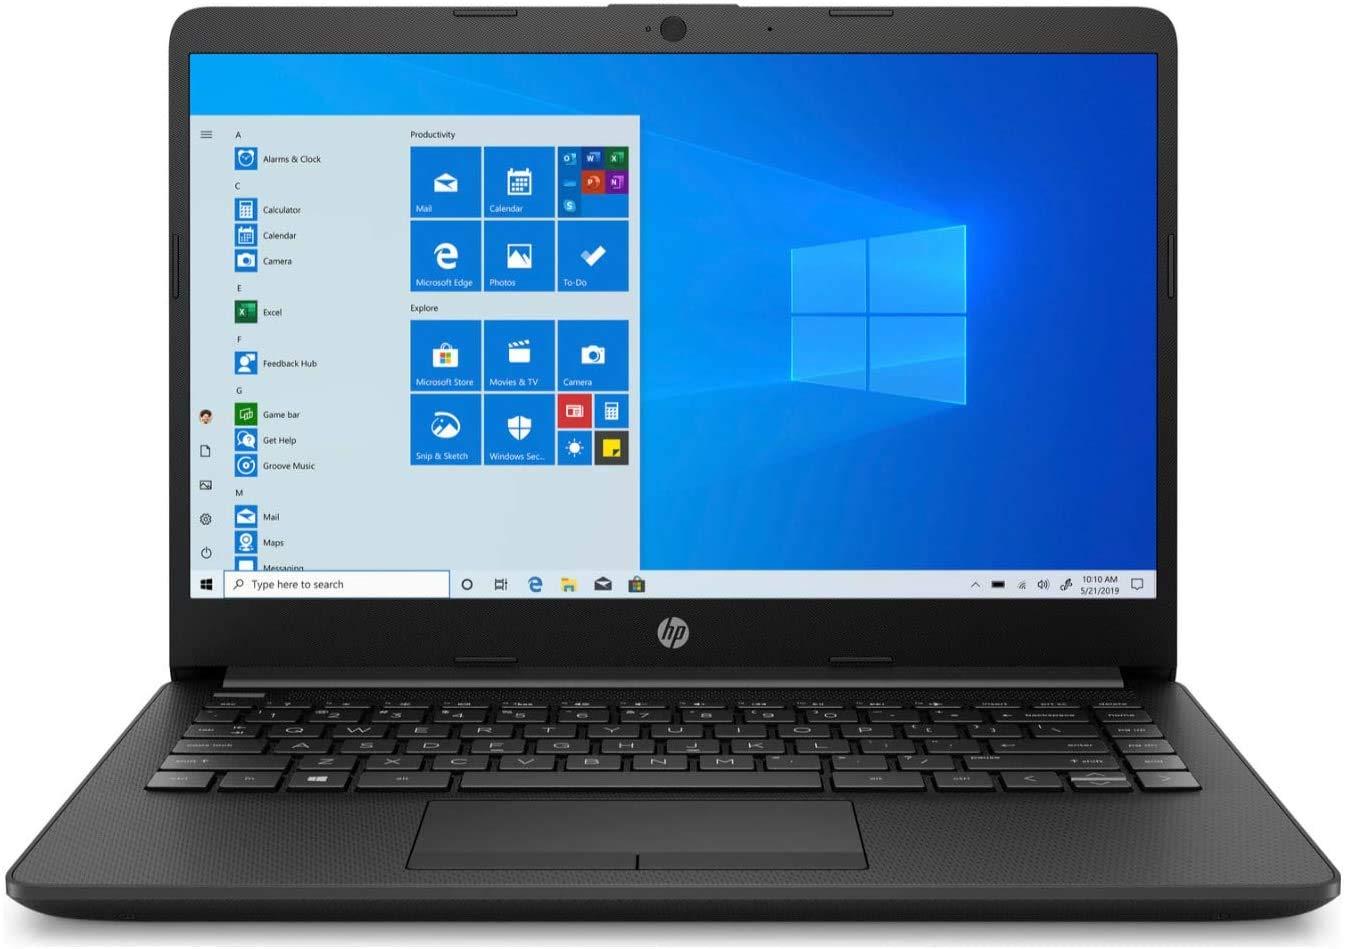 "Newest HP 14"" HD WLED Backlit High Performance Business Laptop, AMD Athlon Silver 3050U up to 3.2GHz, 4GB DDR4, 128GB SSD, Wireless-AC, HDMI, Bluetooth, Webcam, SD Card Reader, Windows 10 S"